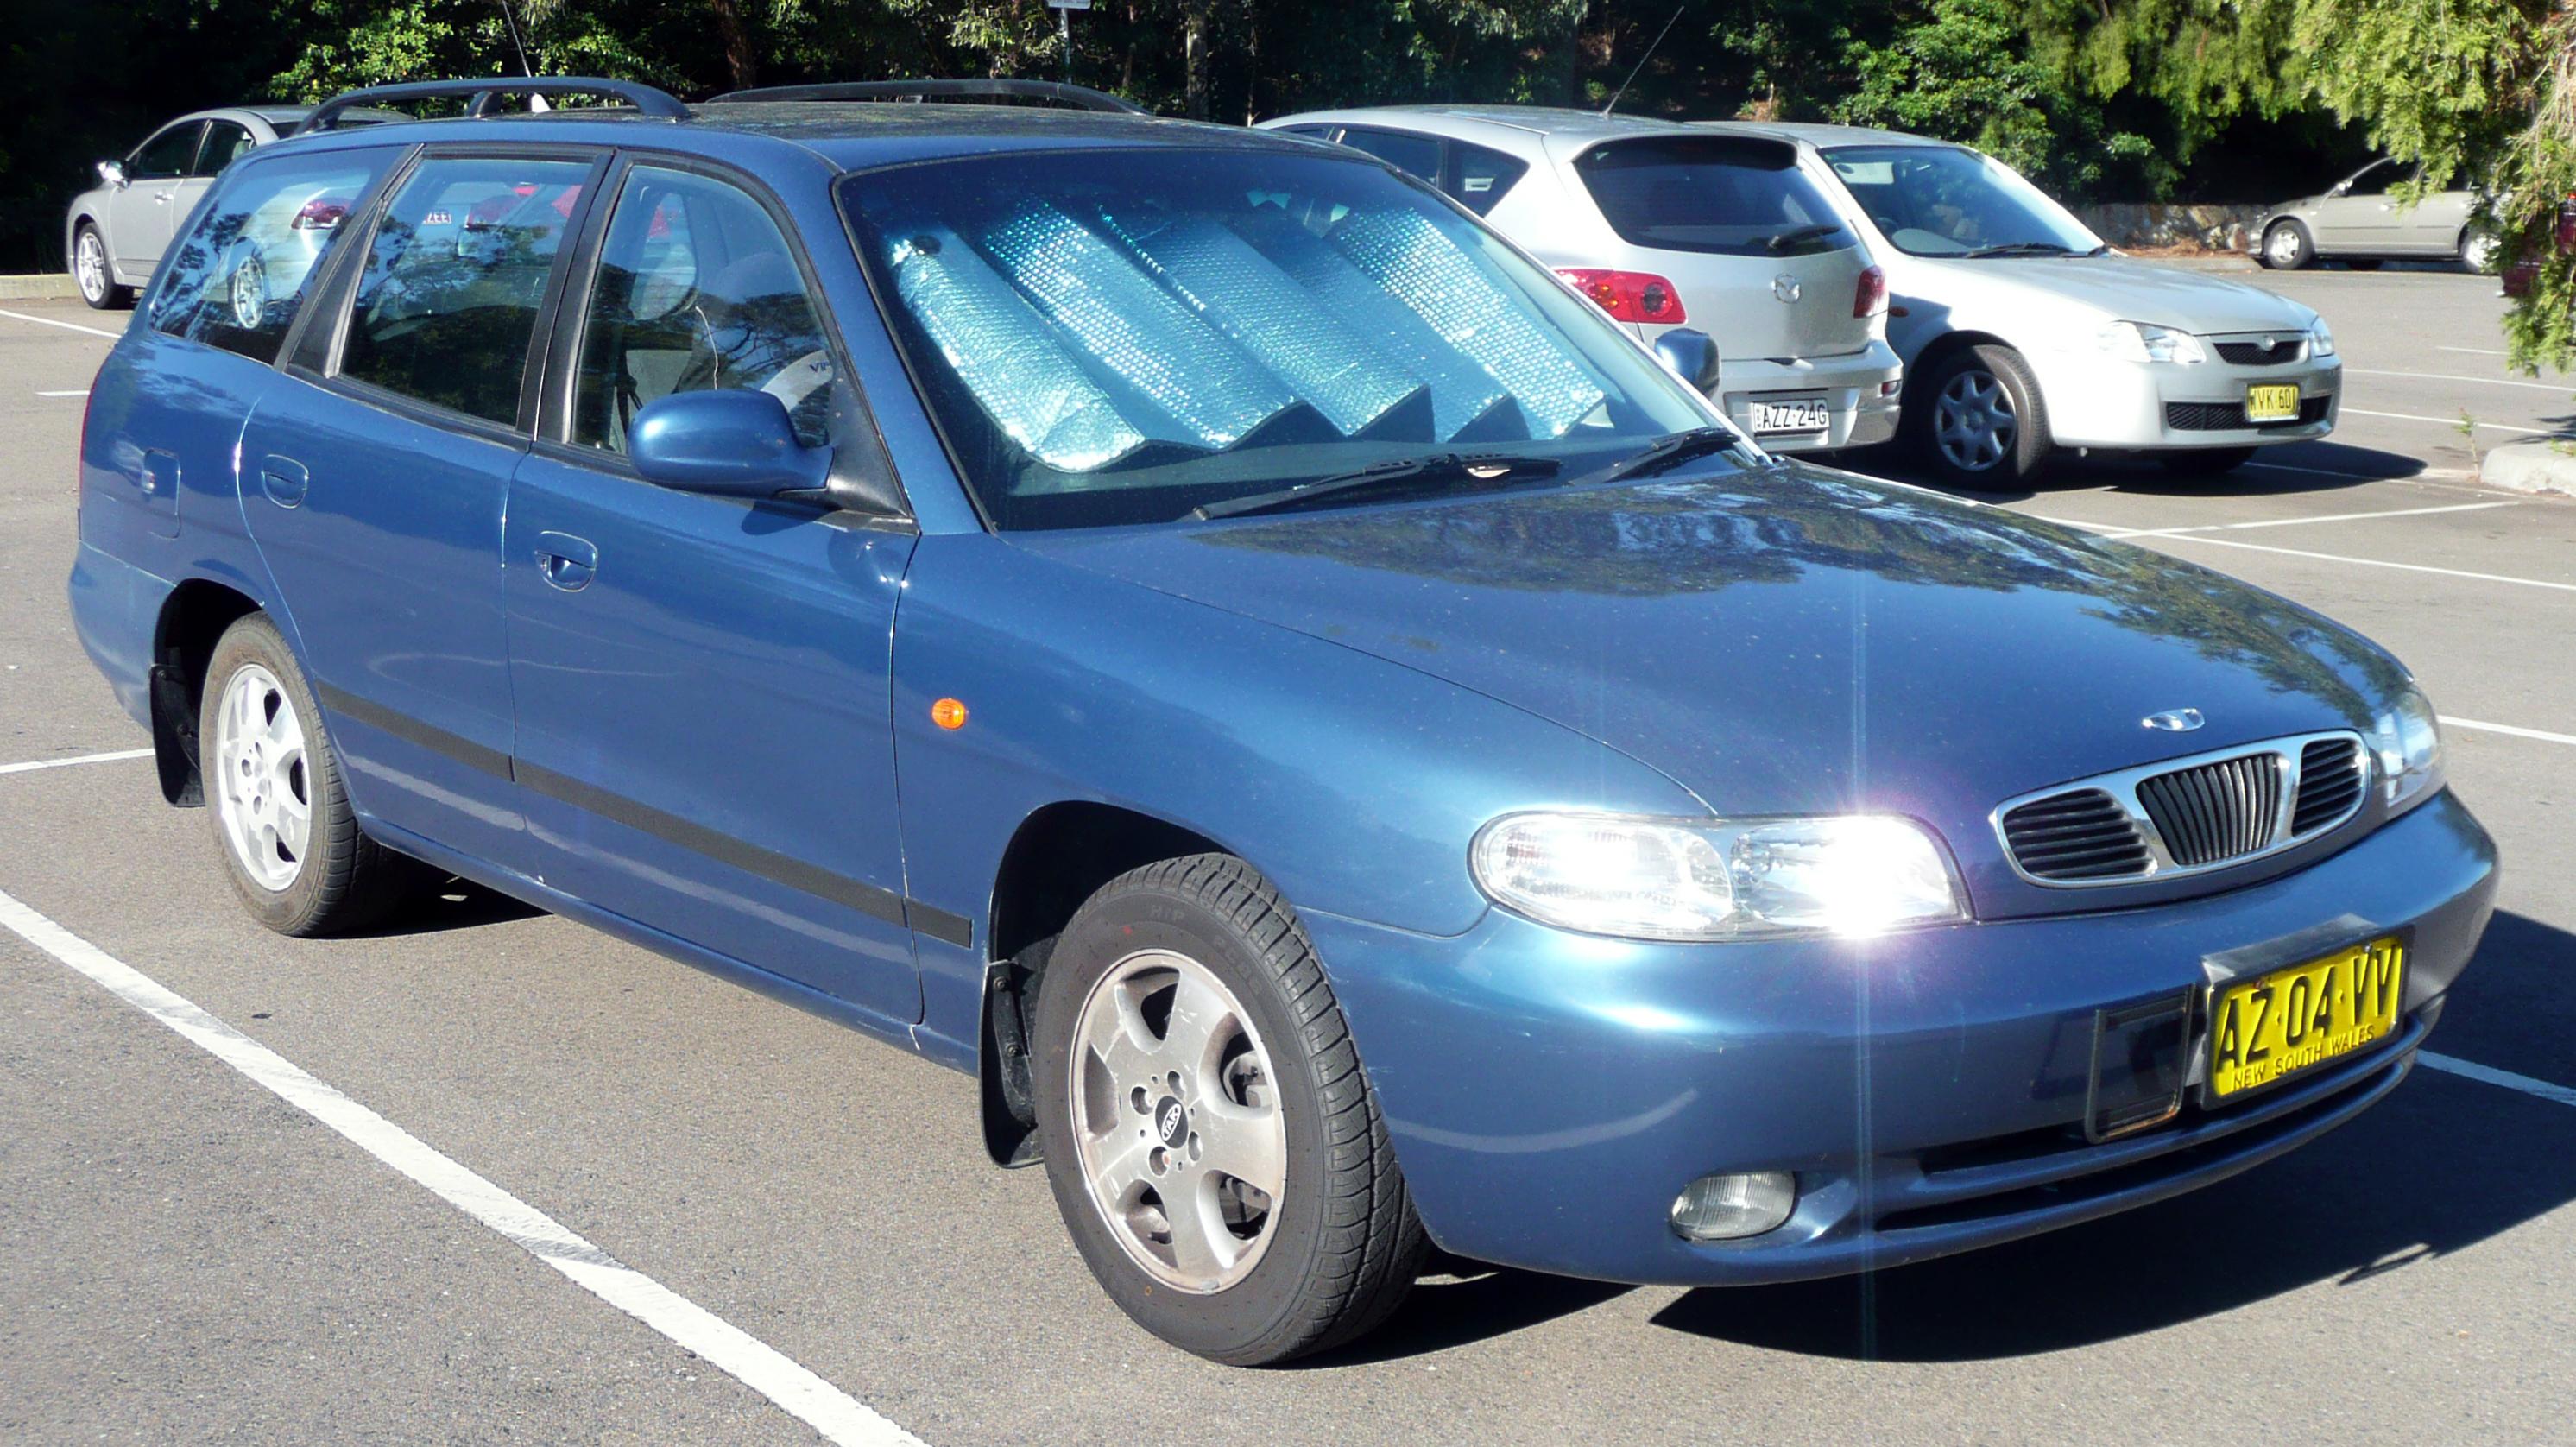 File:1999 Daewoo Nubira (J100) X Series EuroWagon station wagon (2009-